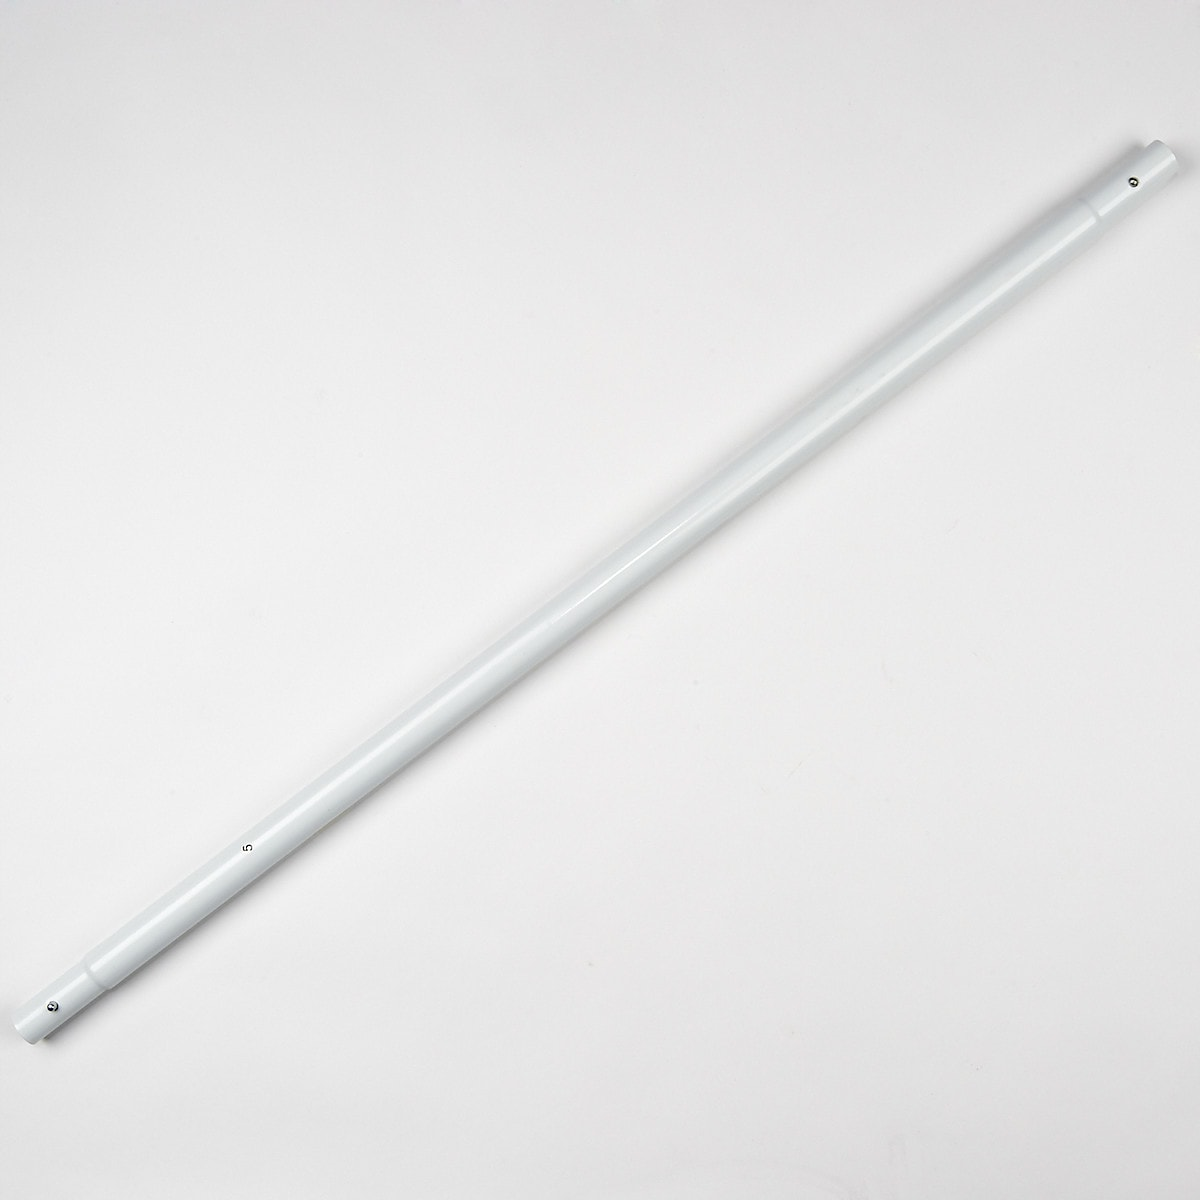 Pole (5) 1053 mm